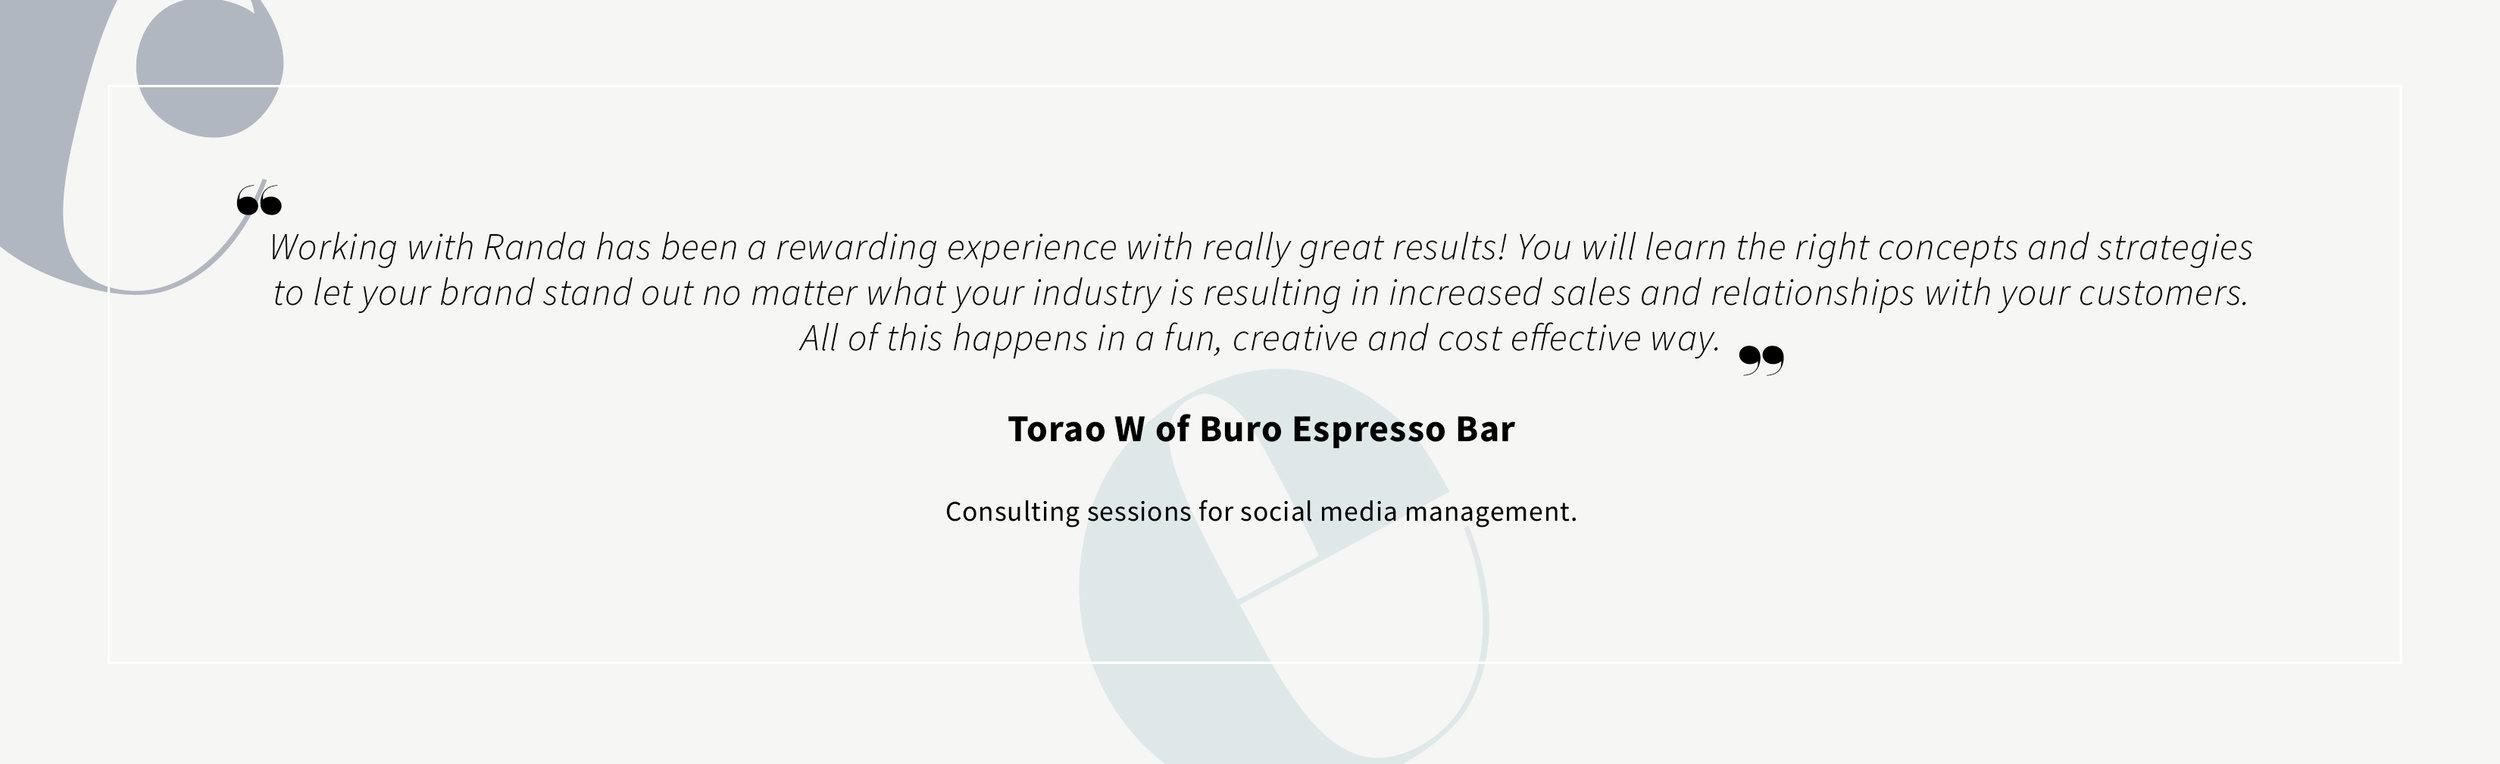 Torao W of Buro Espresso Bar Testimonial.jpg